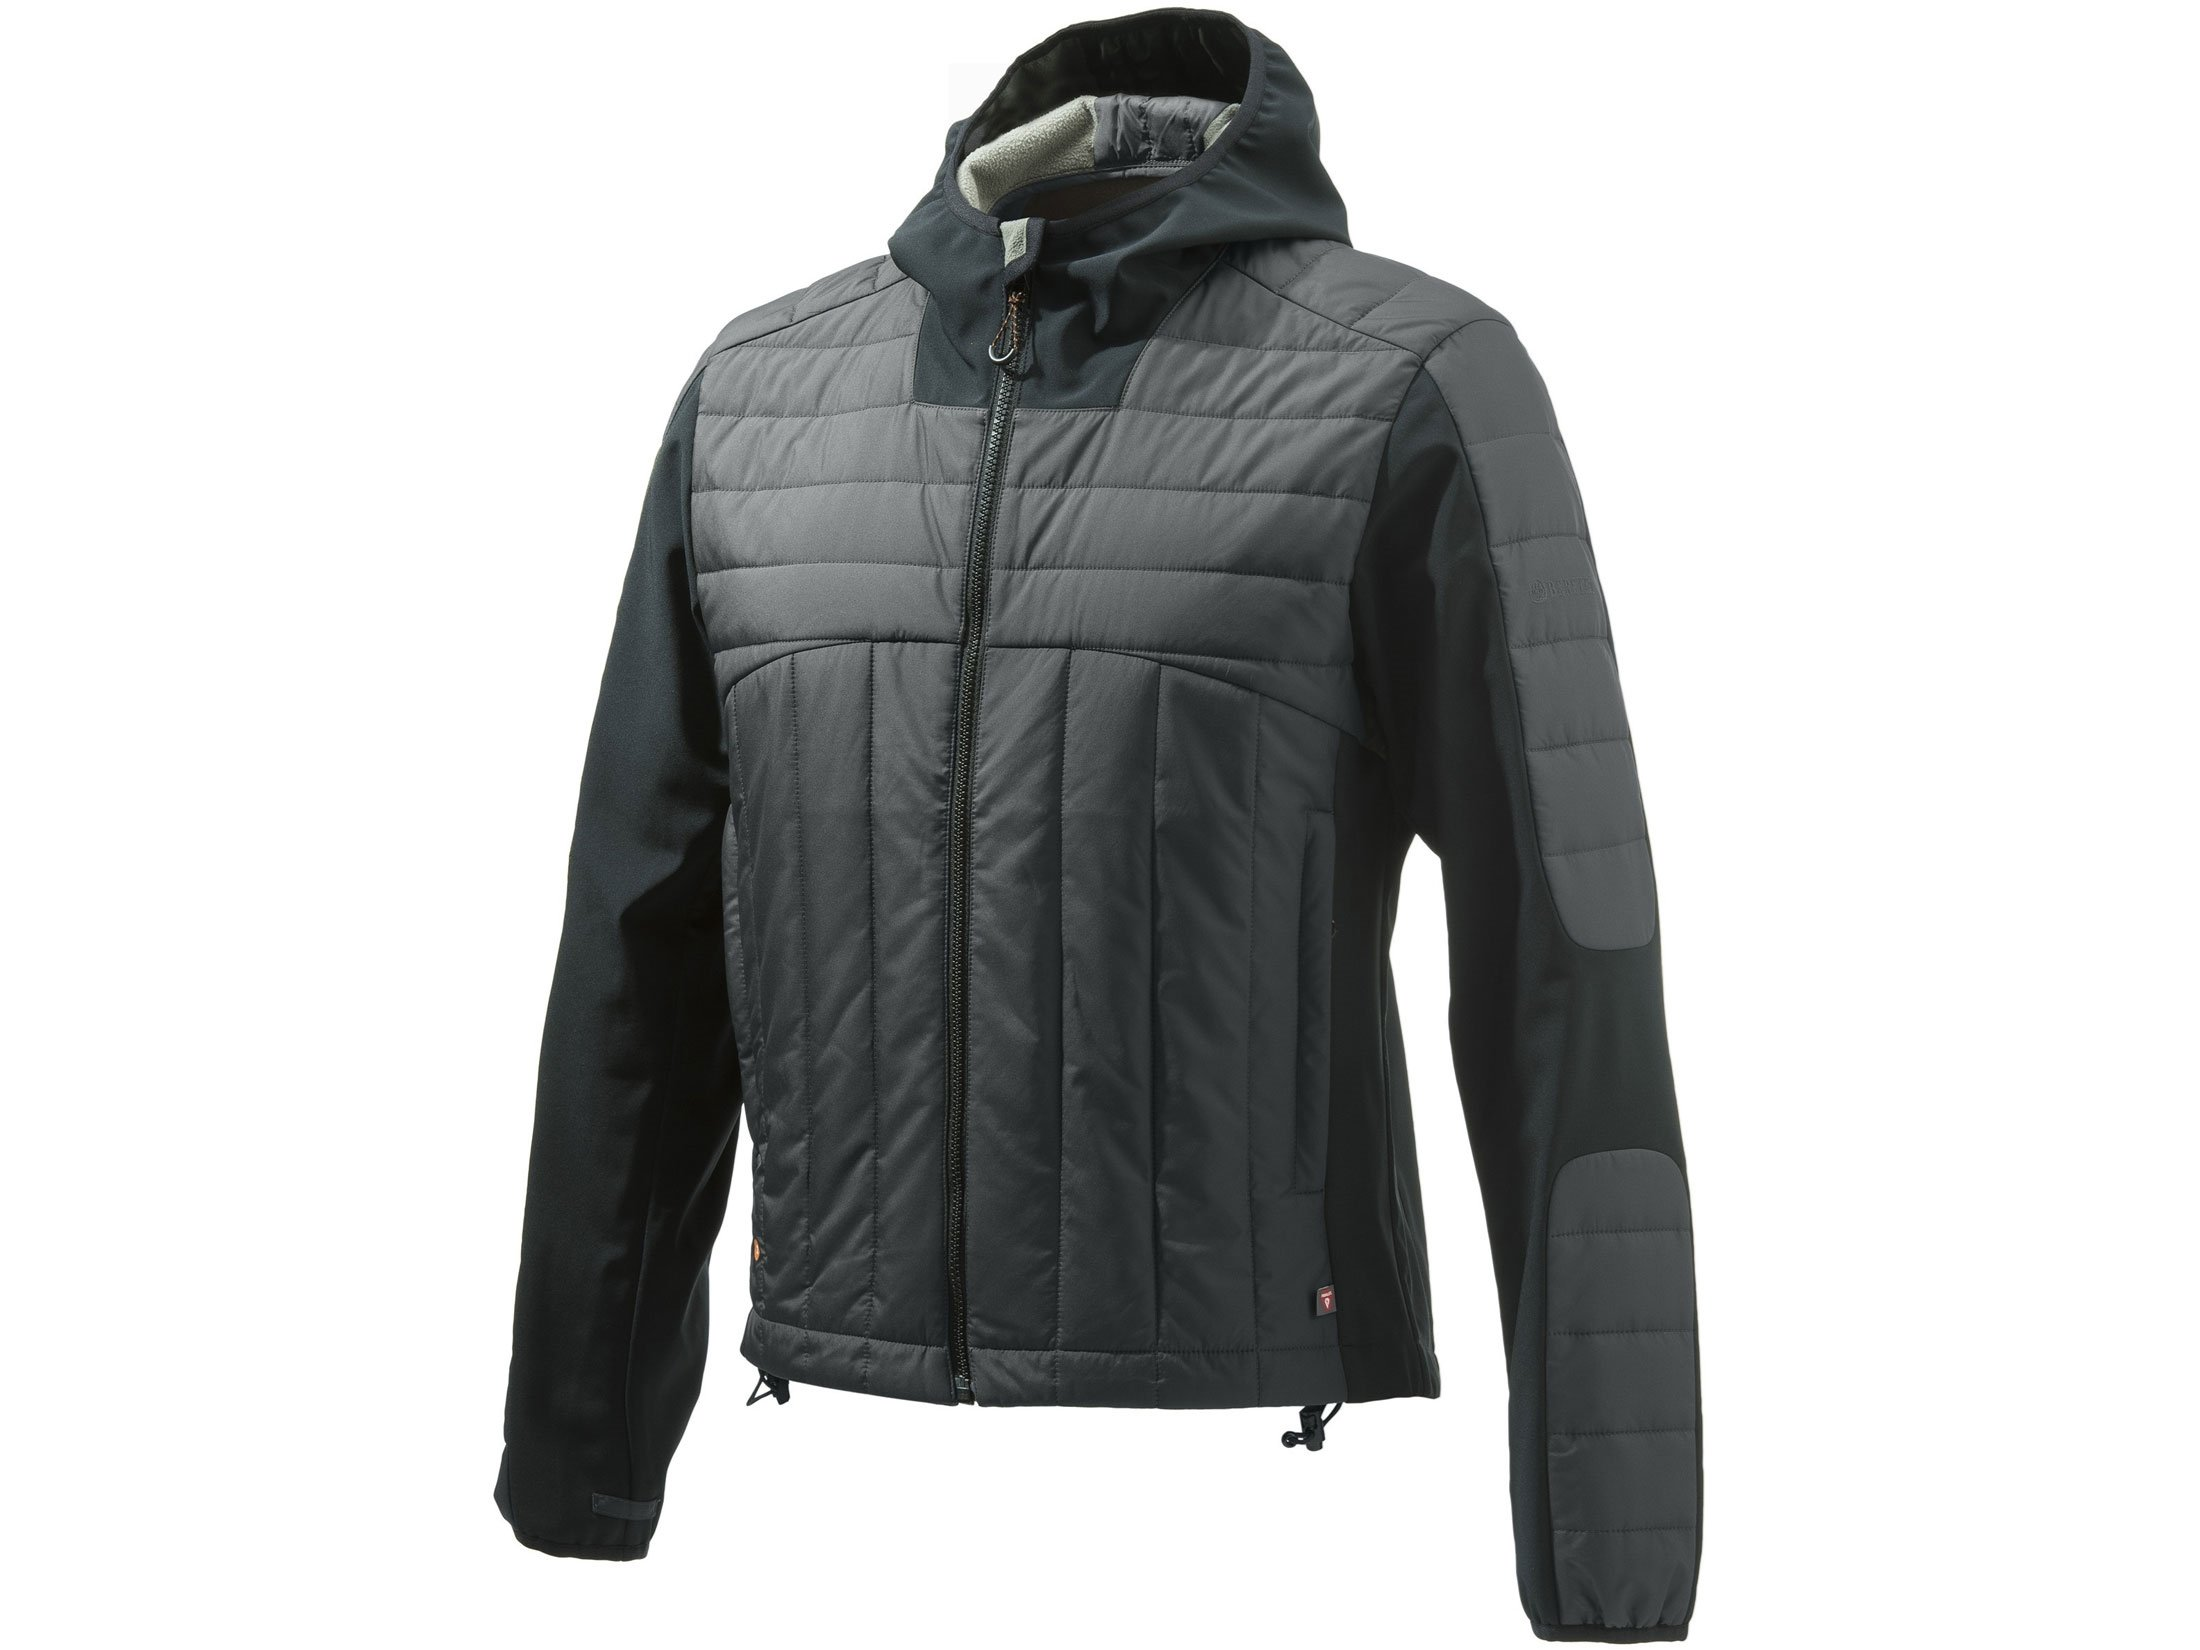 Beretta BIS Softshell Jacket black XL by Beretta